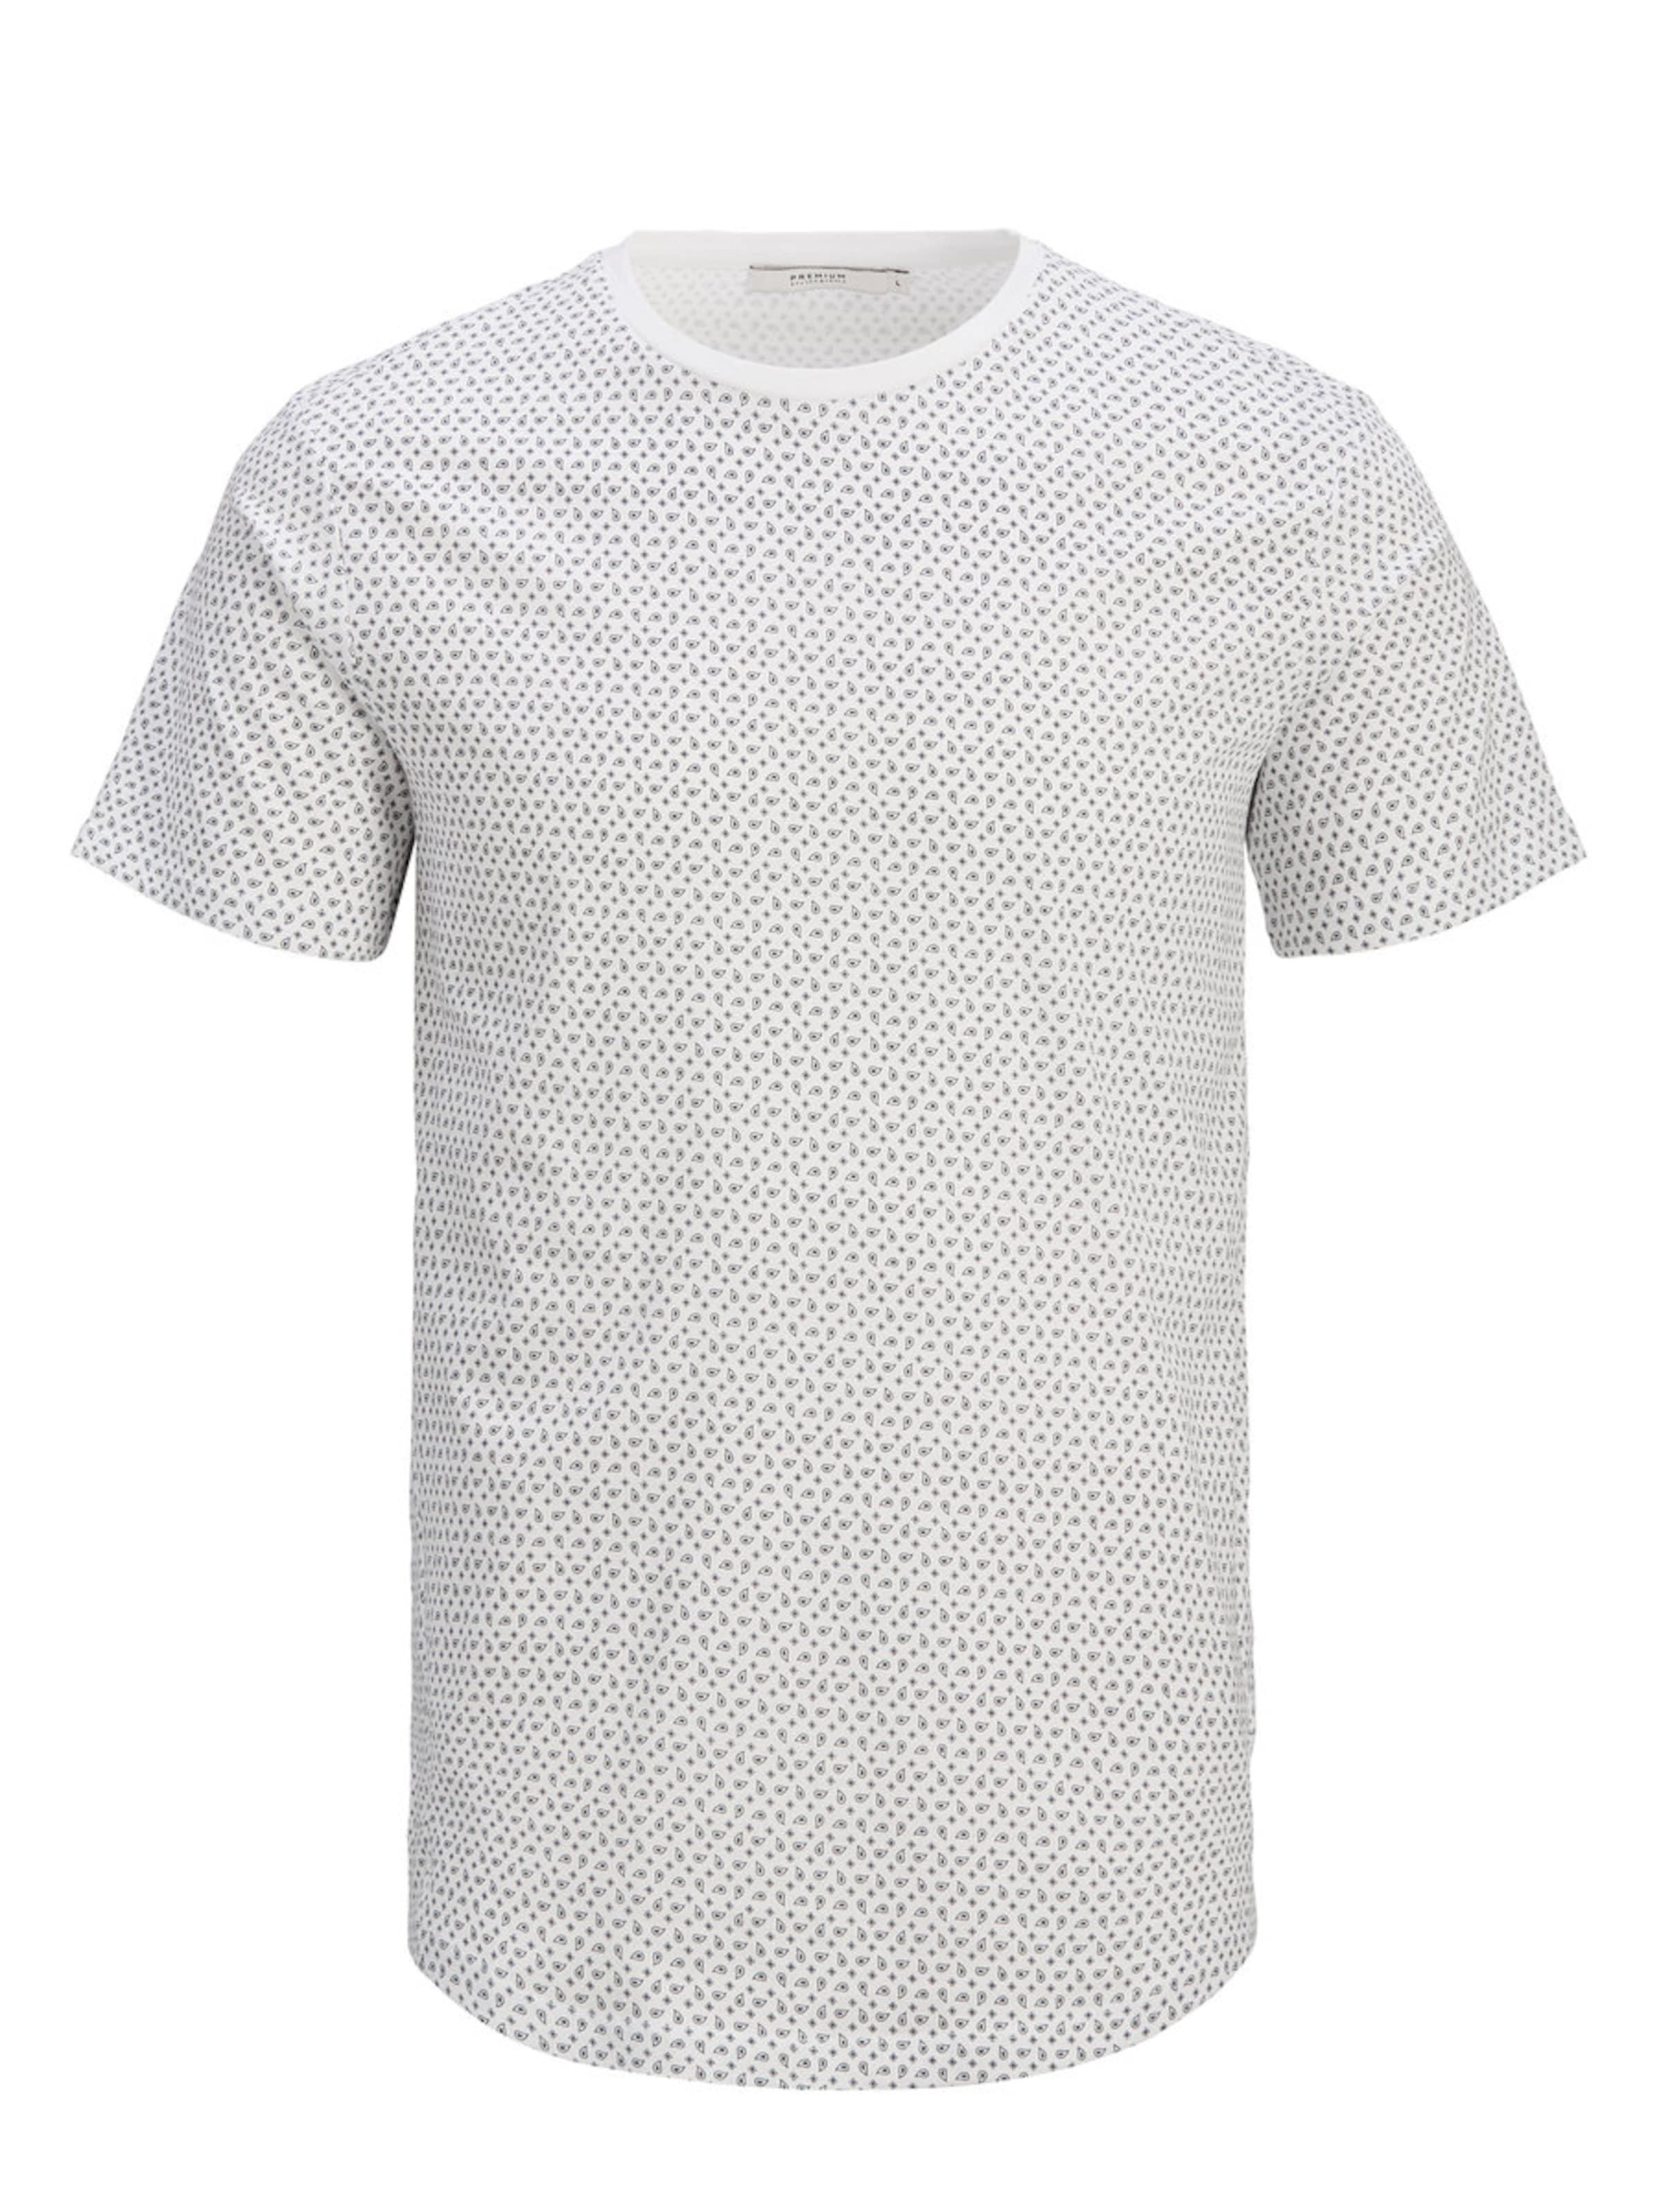 Jackamp; shirt Bleu En Jones T FoncéBlanc CWxBorde